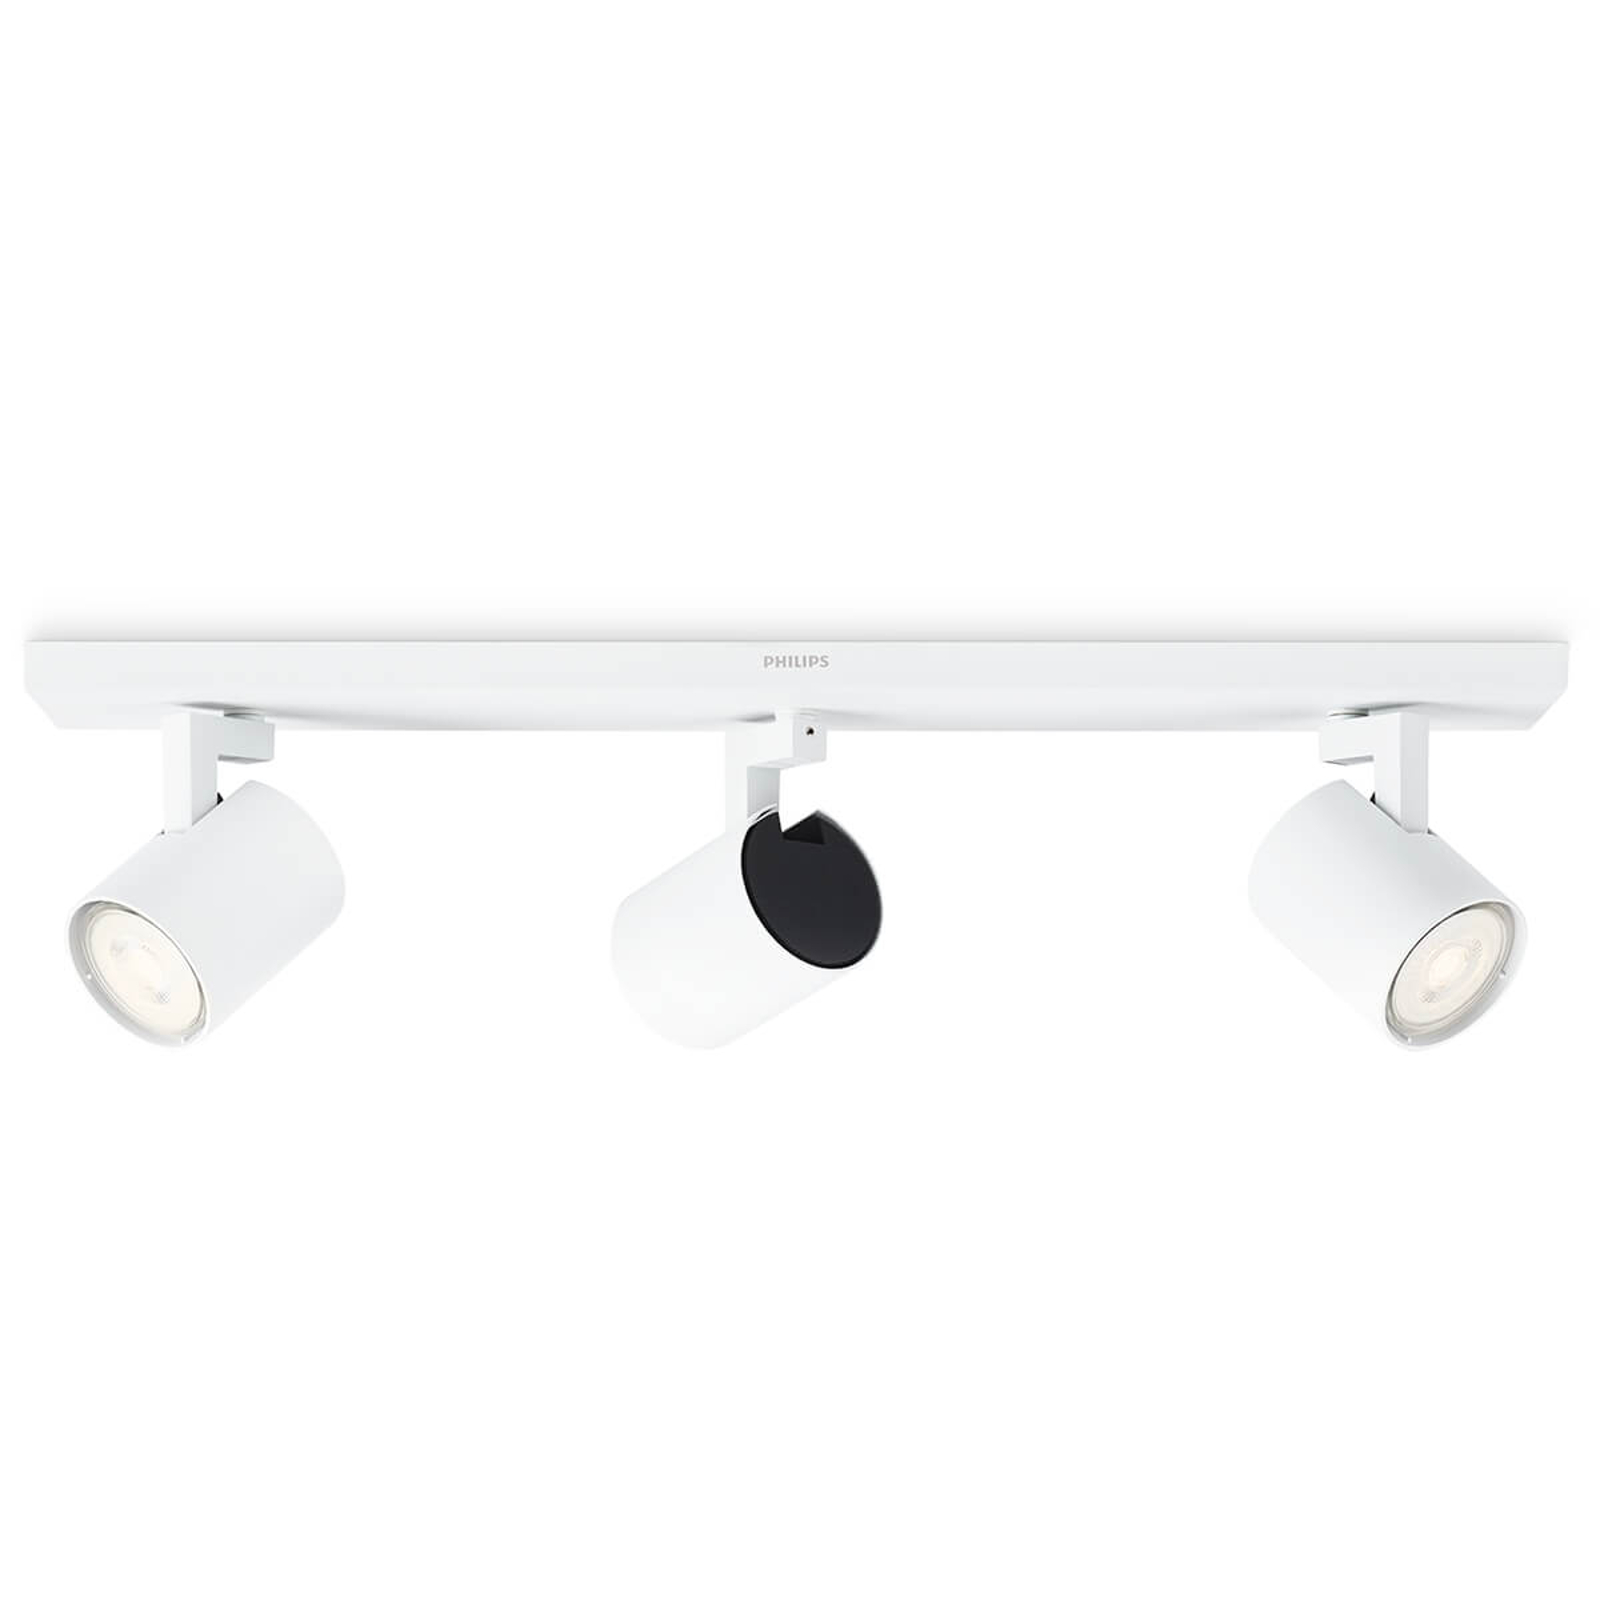 Philips Runner faretto LED bianco 3 luci